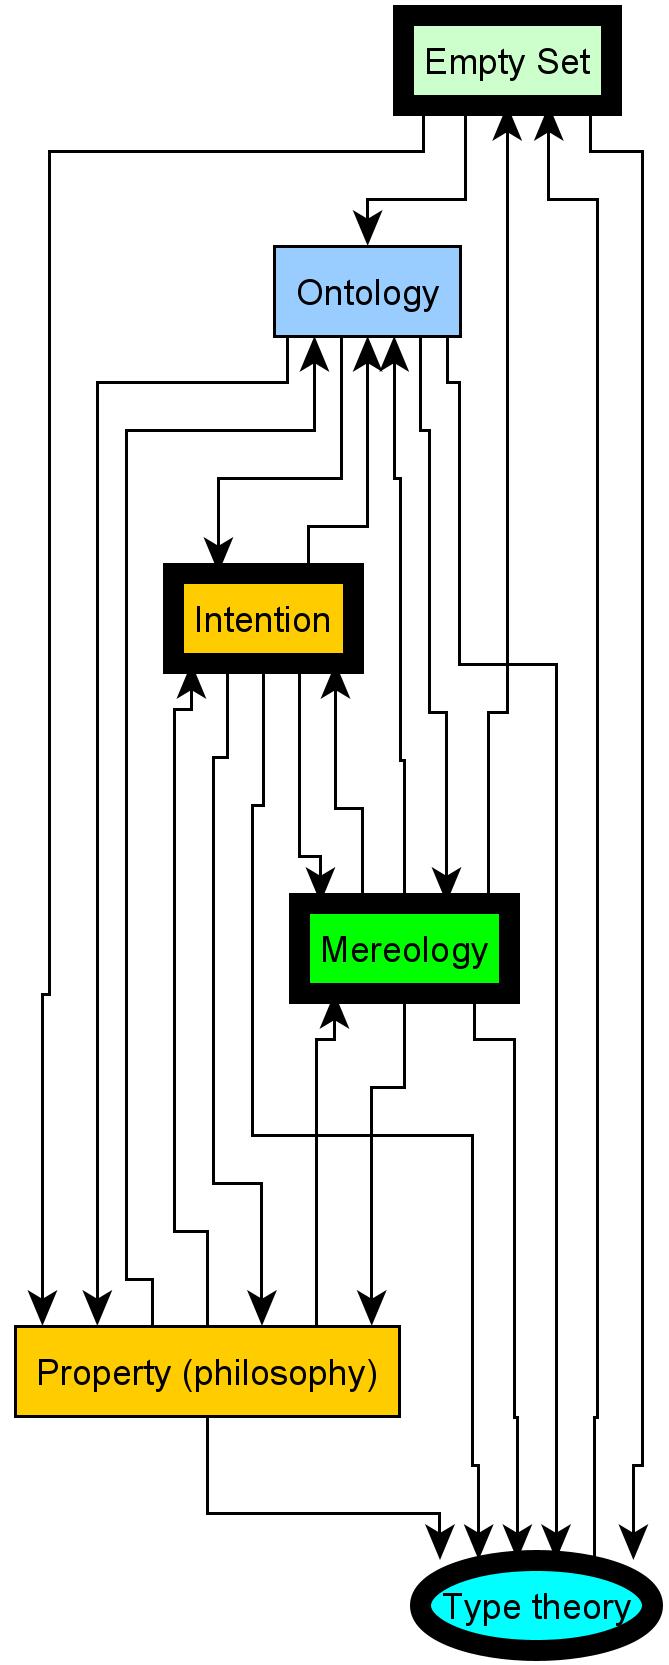 Empty_set_to_Type_theory